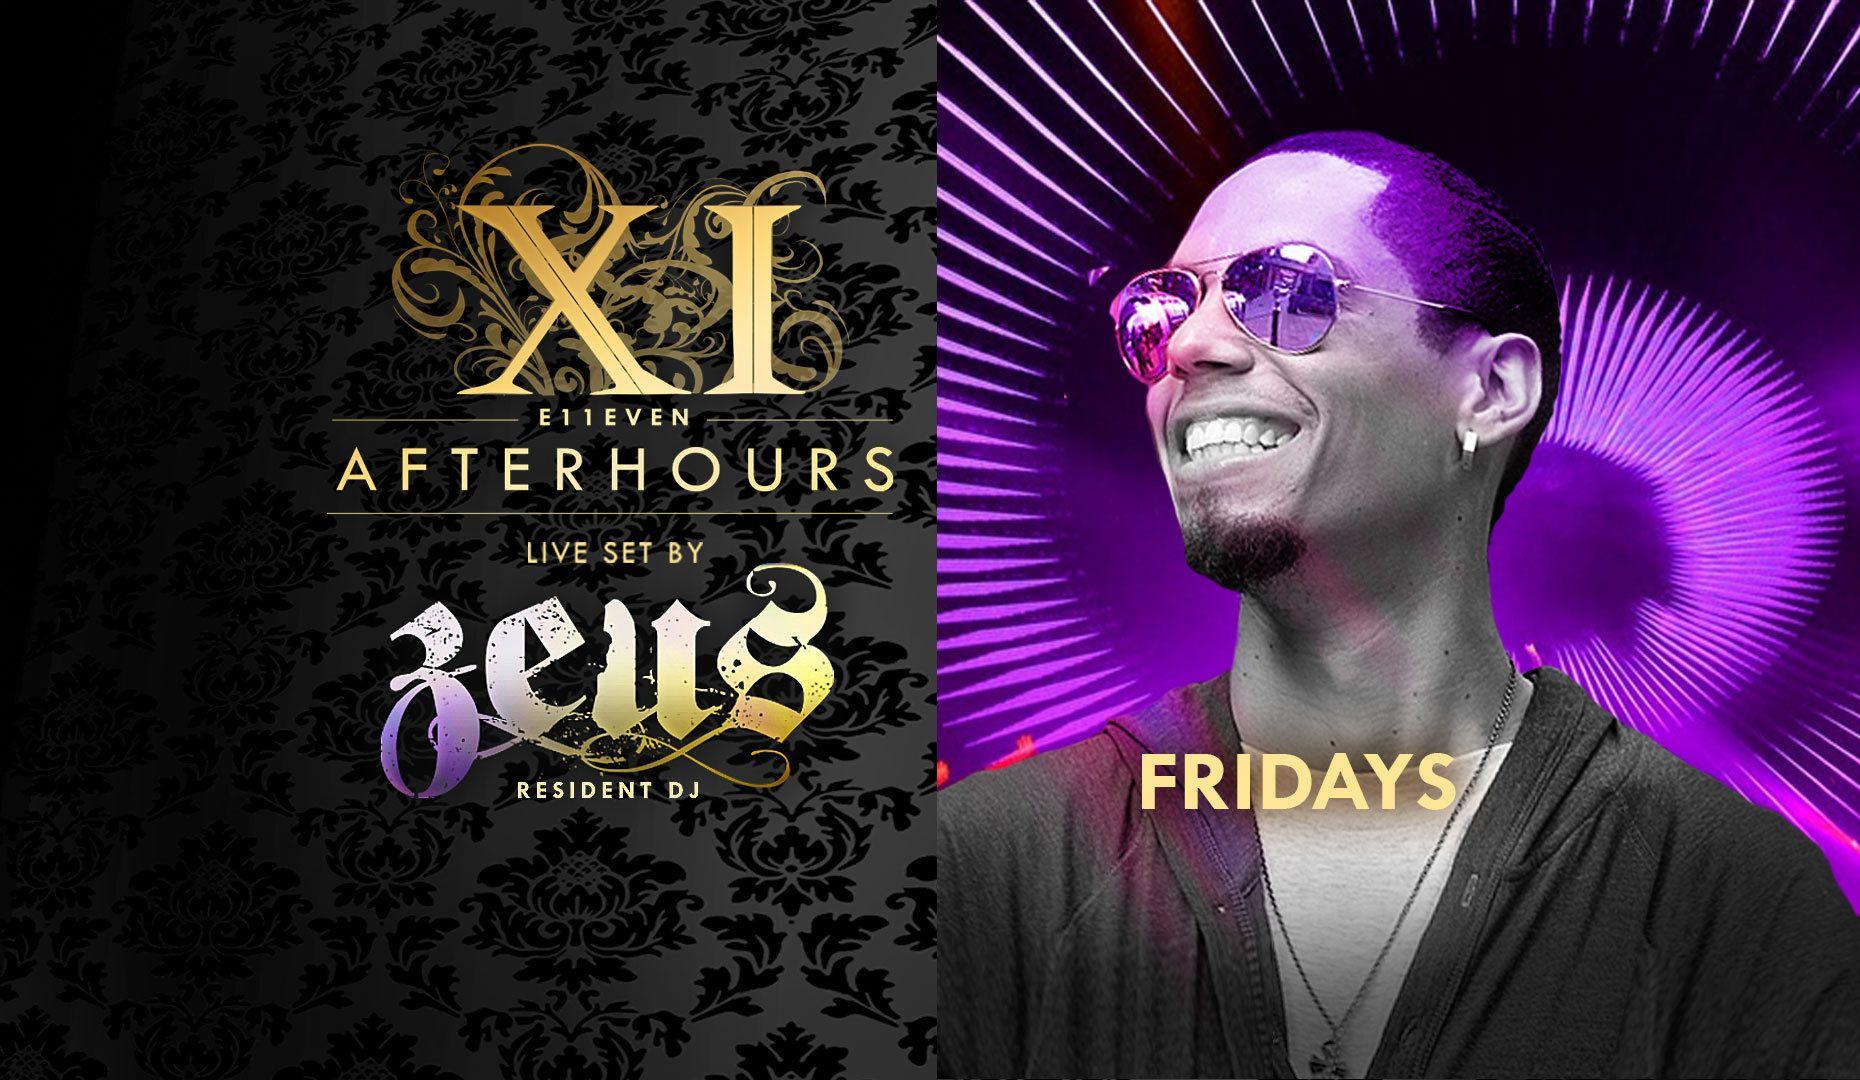 Friday's At @e11even Miami Afterhours Dj Zeus